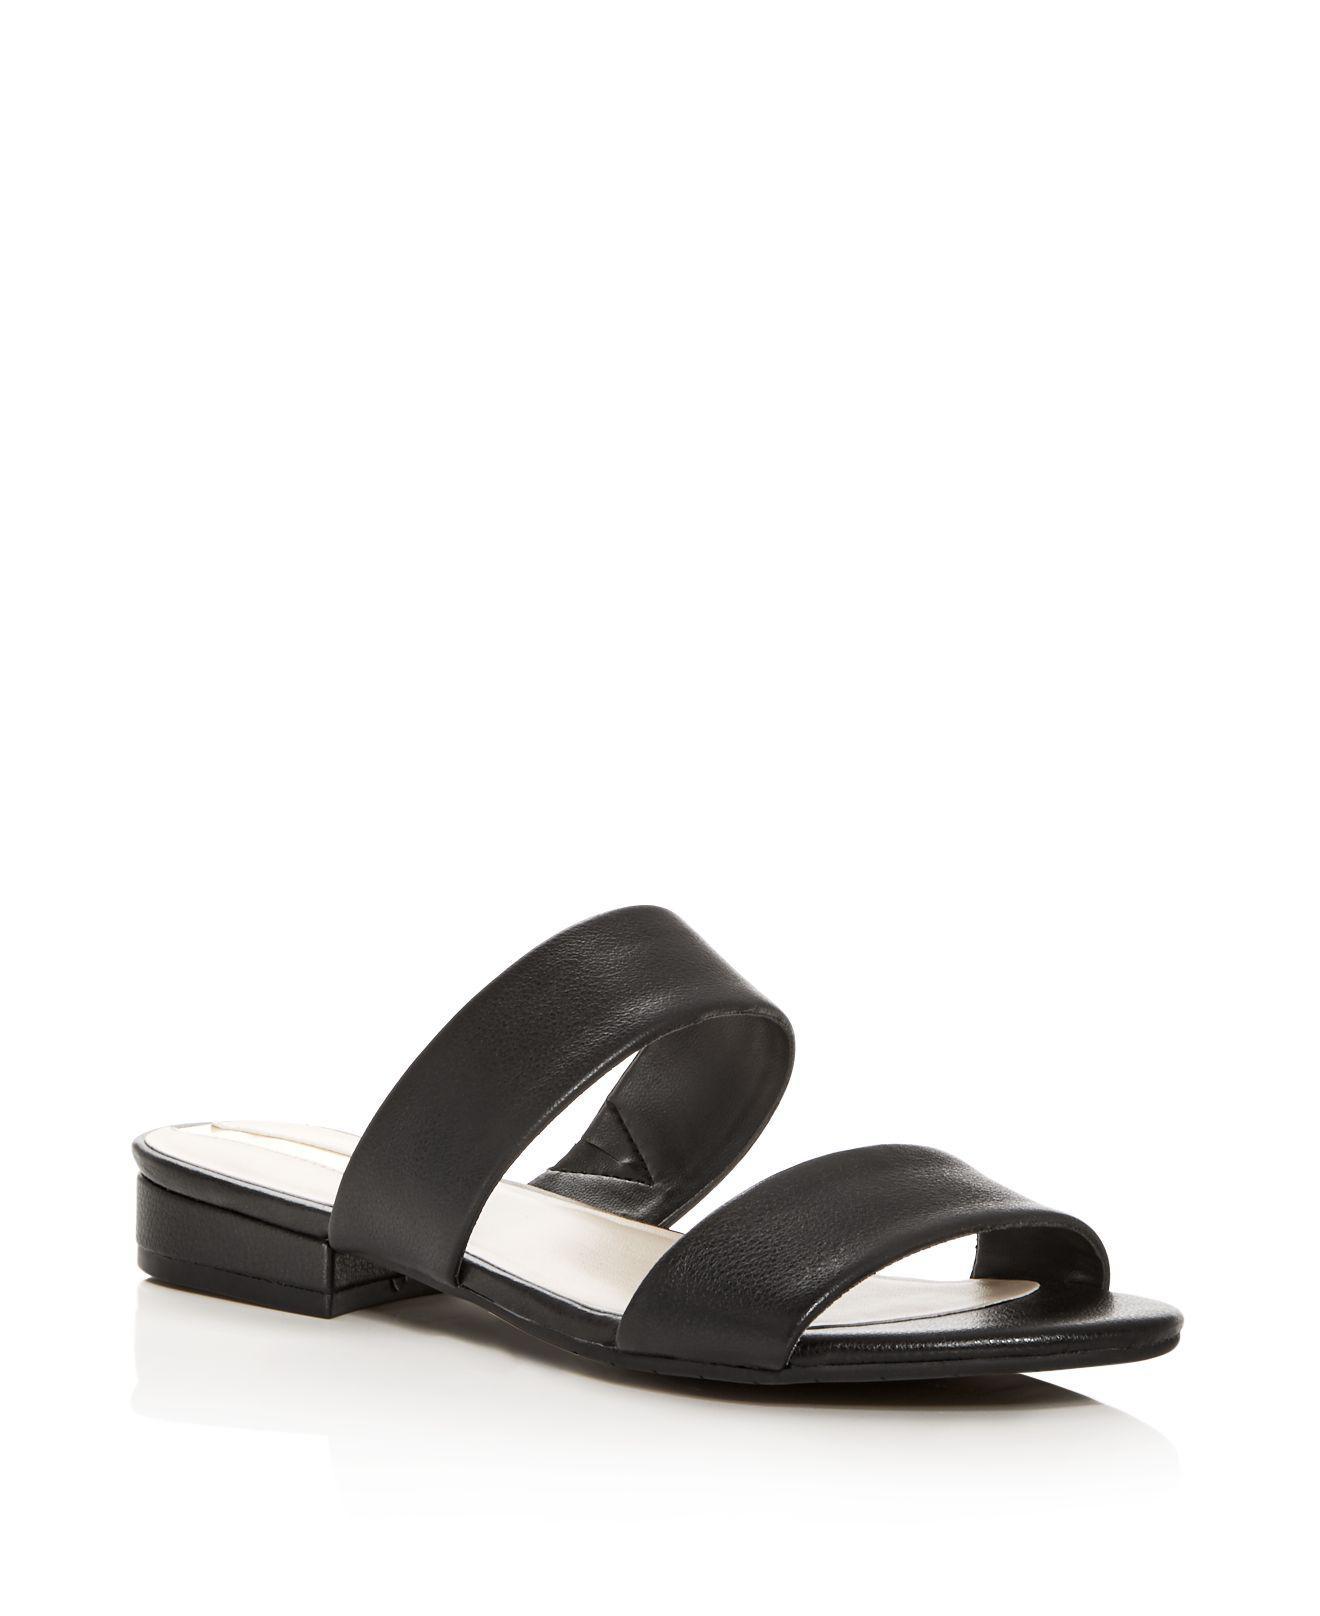 Kenneth Cole Women's Viola Leather Low Heel Slide Sandals vdbcV6jpIU